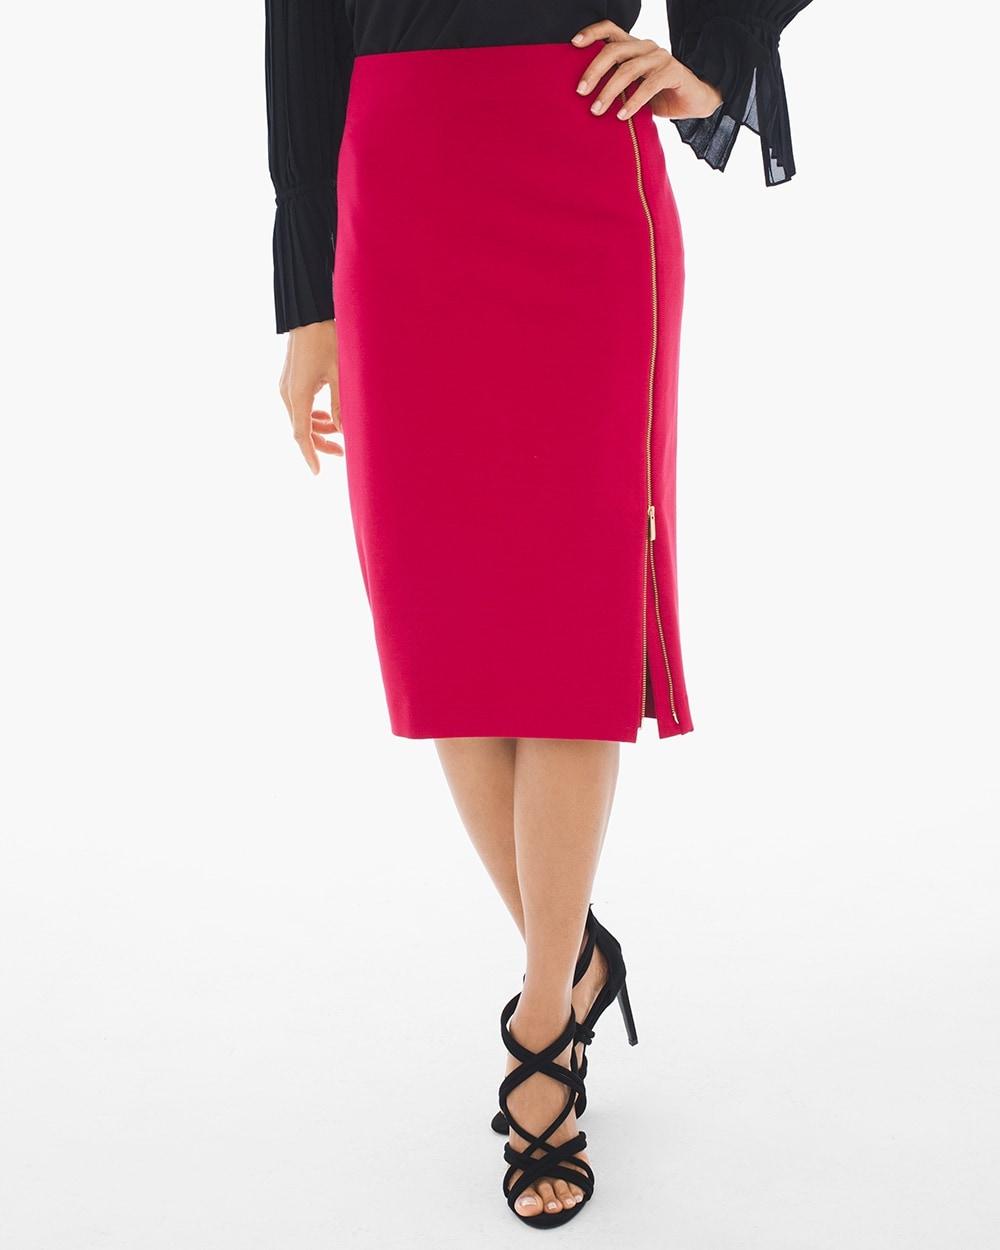 ce6242b1ca Side-Zip Ponte Pencil Skirt - Chico's